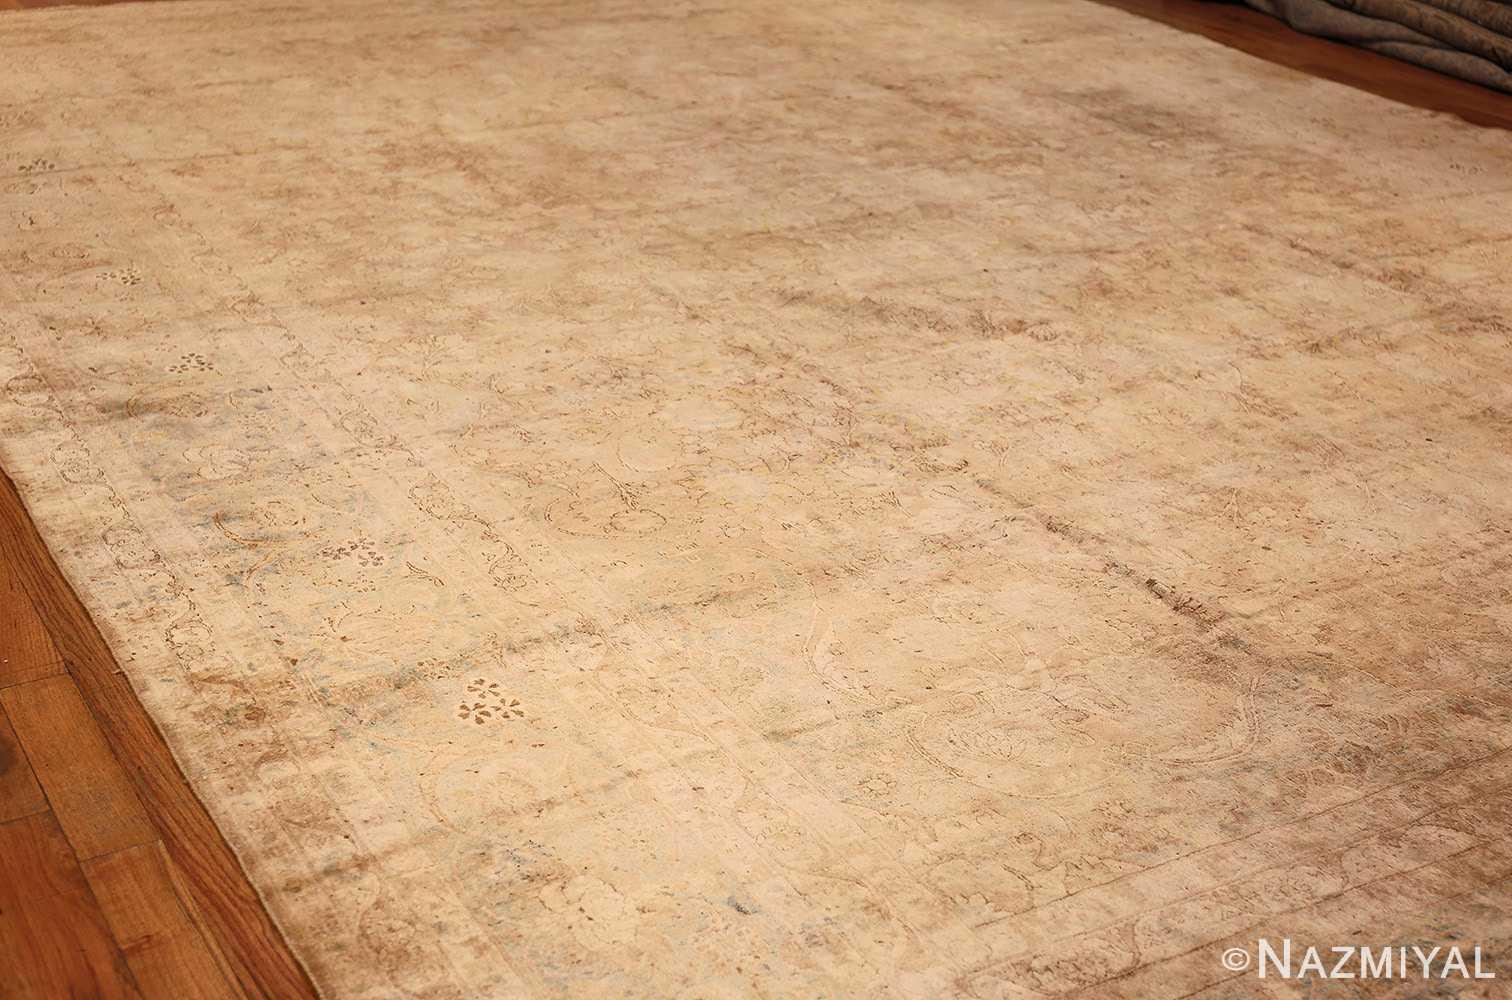 large and decorative antique persian tabriz rug 48740 whole Nazmiyal